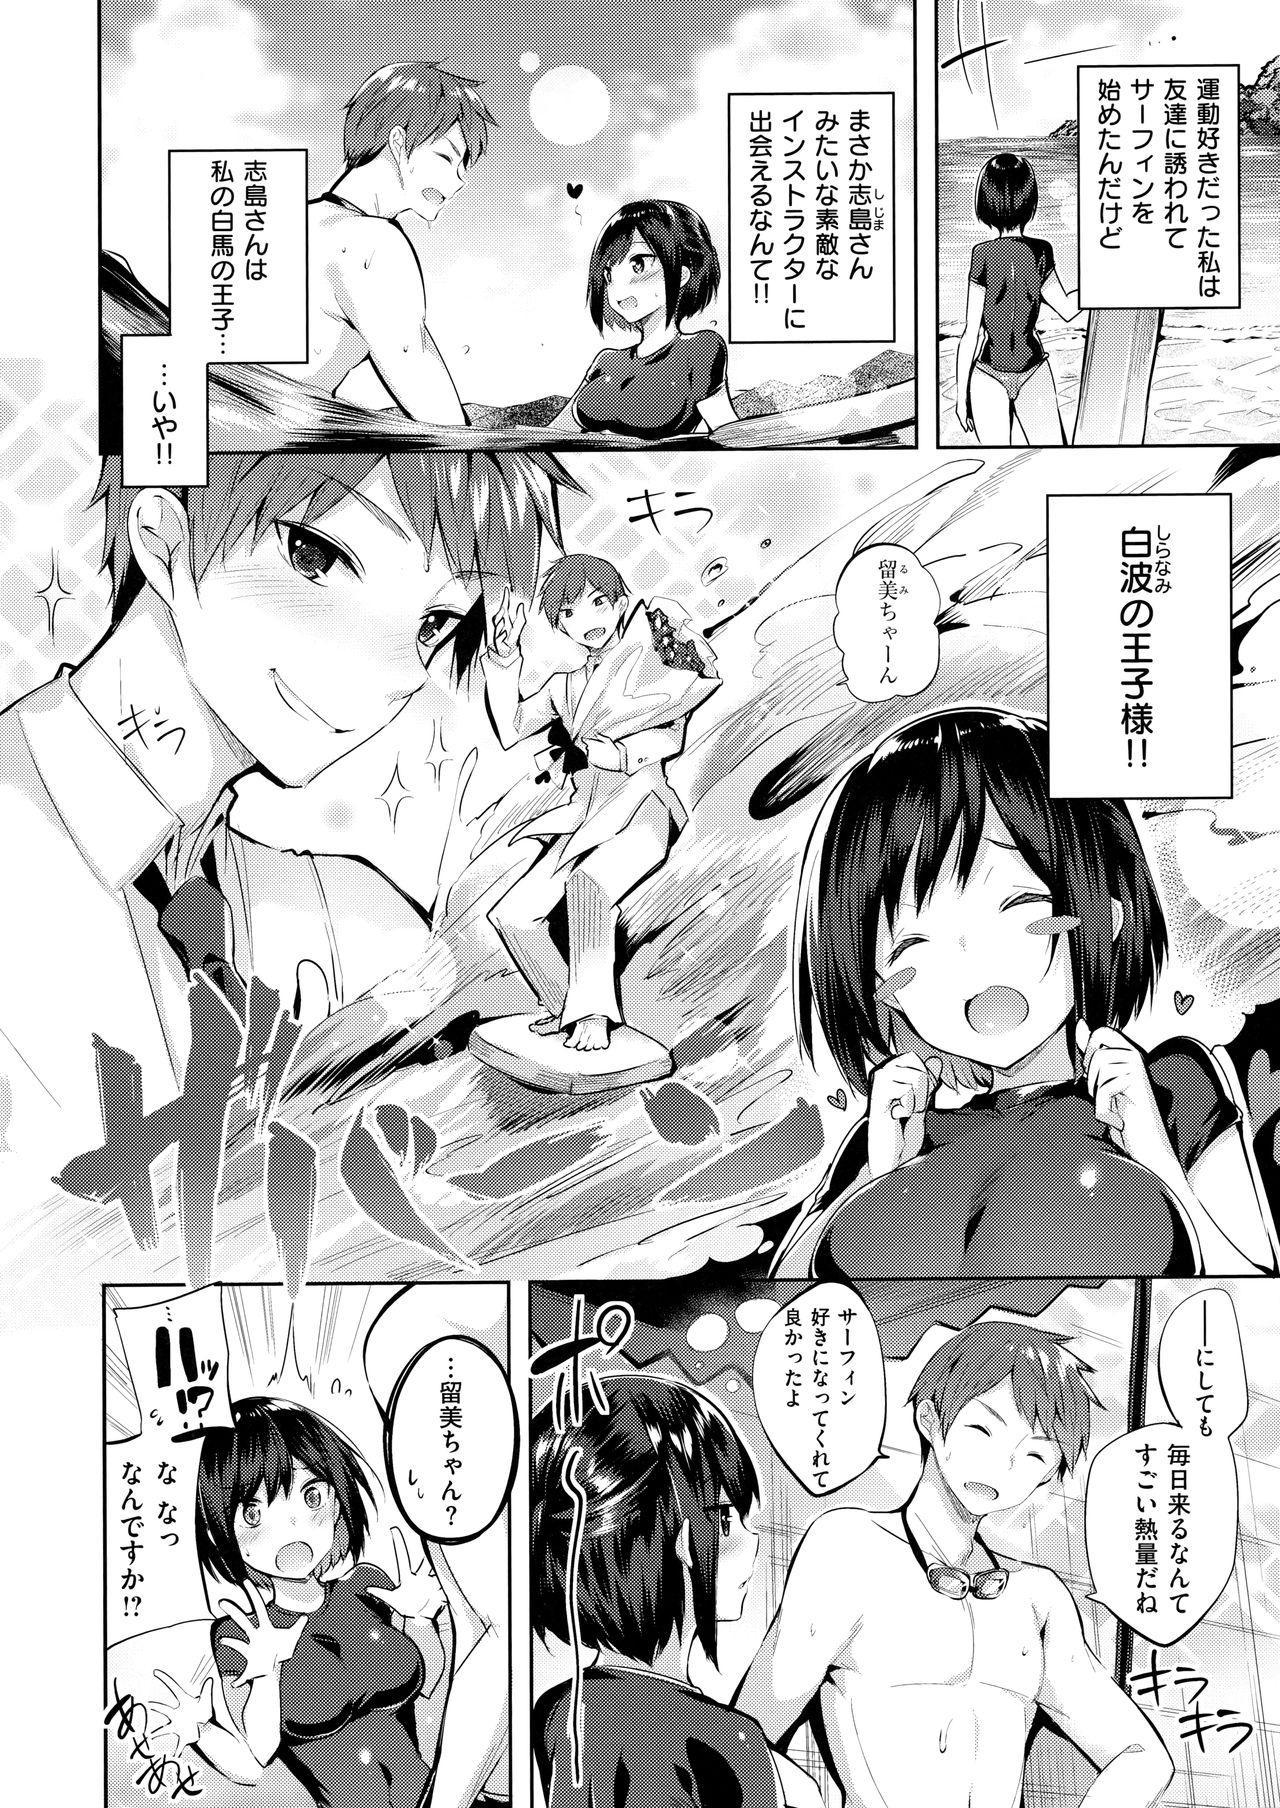 Nakadashi Strike! - Winning strike! 143